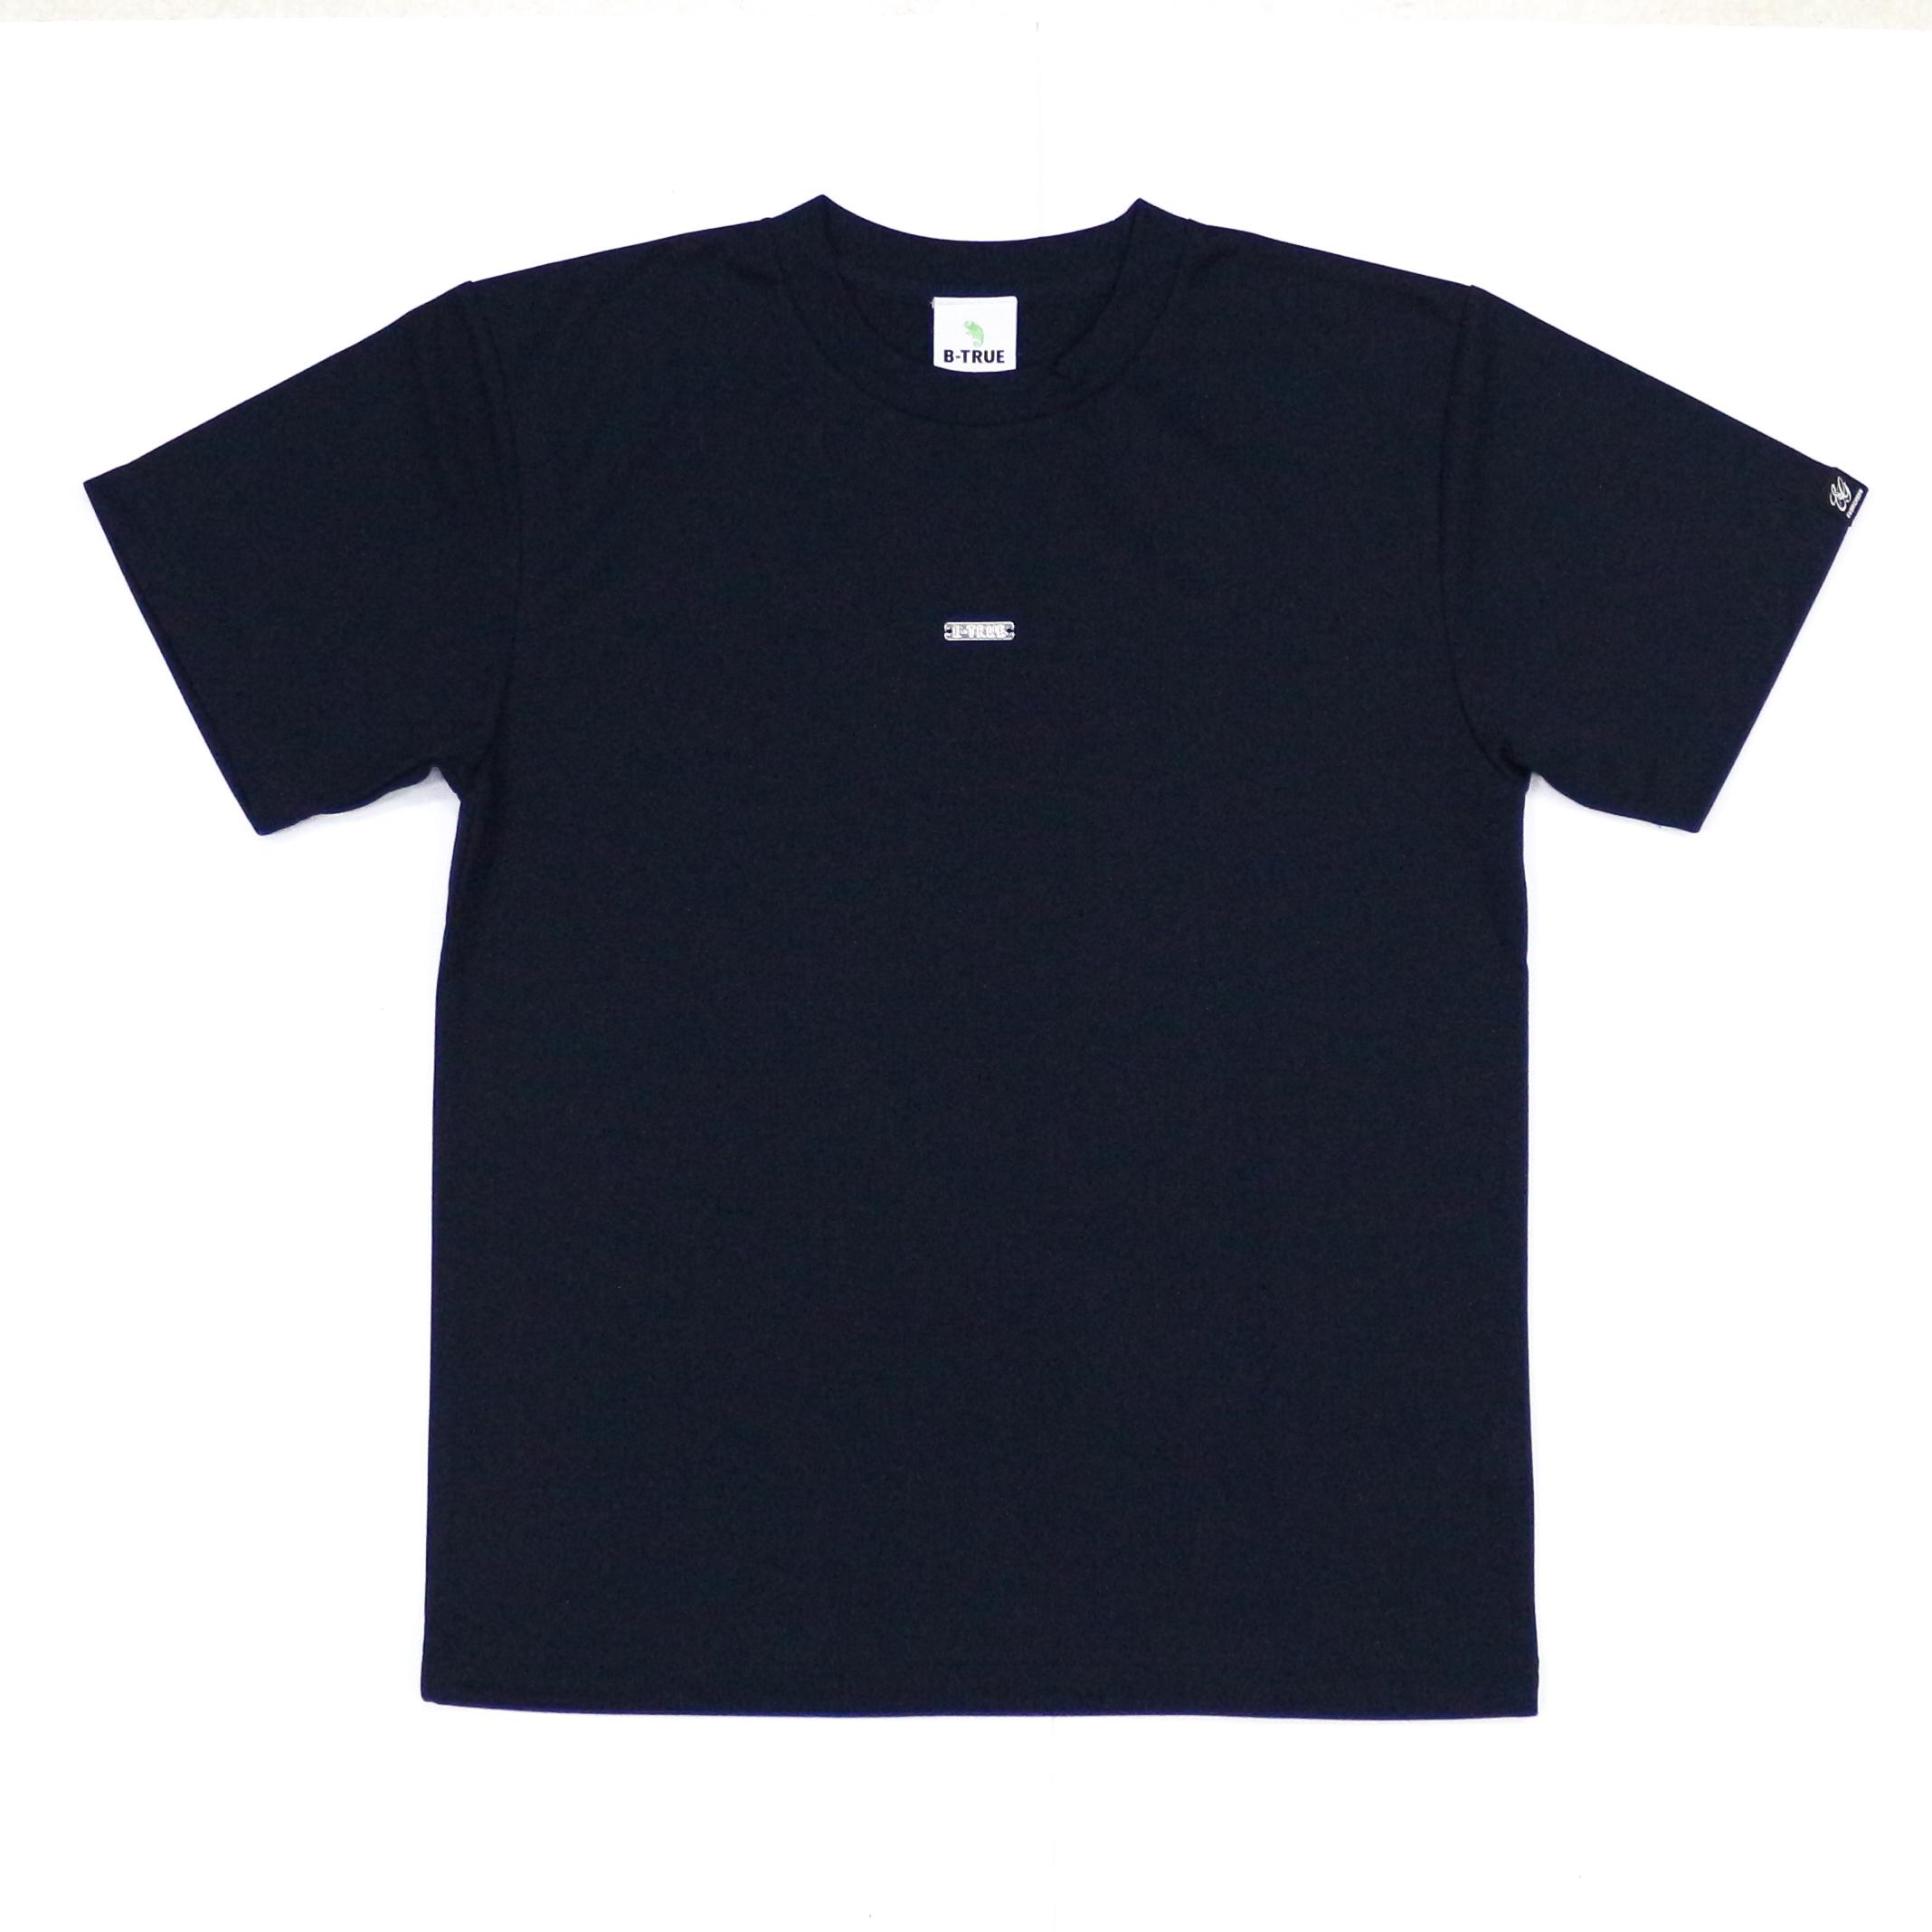 Evergreen T-Shirt Dry Fit Short Sleeve B-True B Type Size LL Navy (6499)